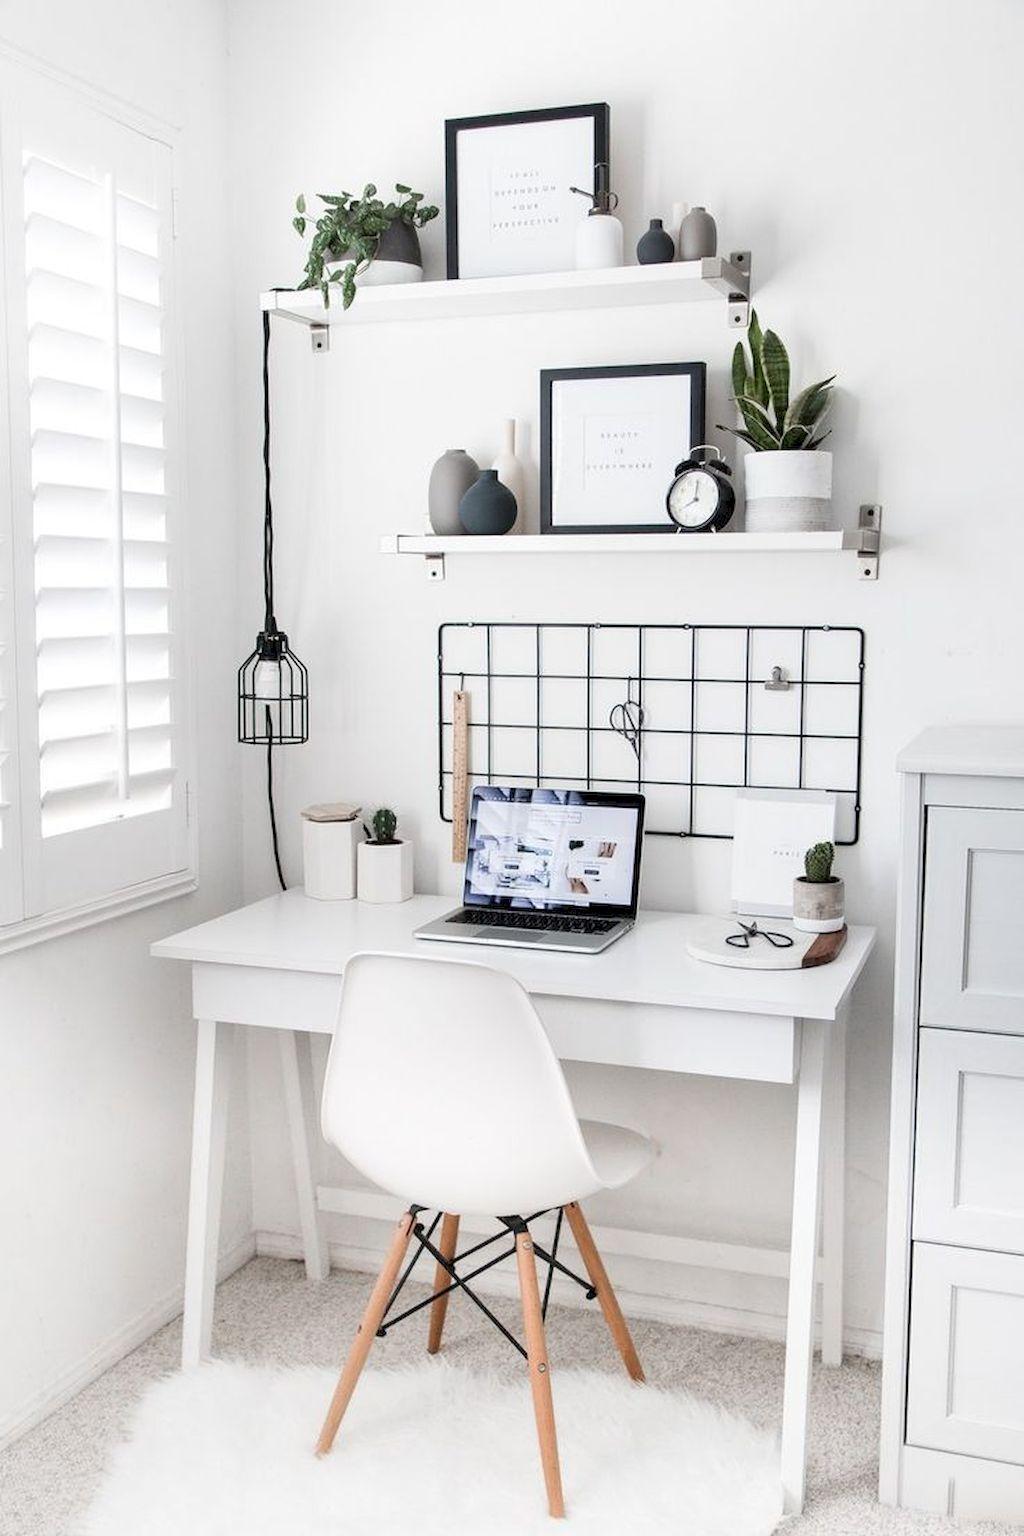 50 Modern Small Living Room Design Ideas | Pinterest | Small living ...